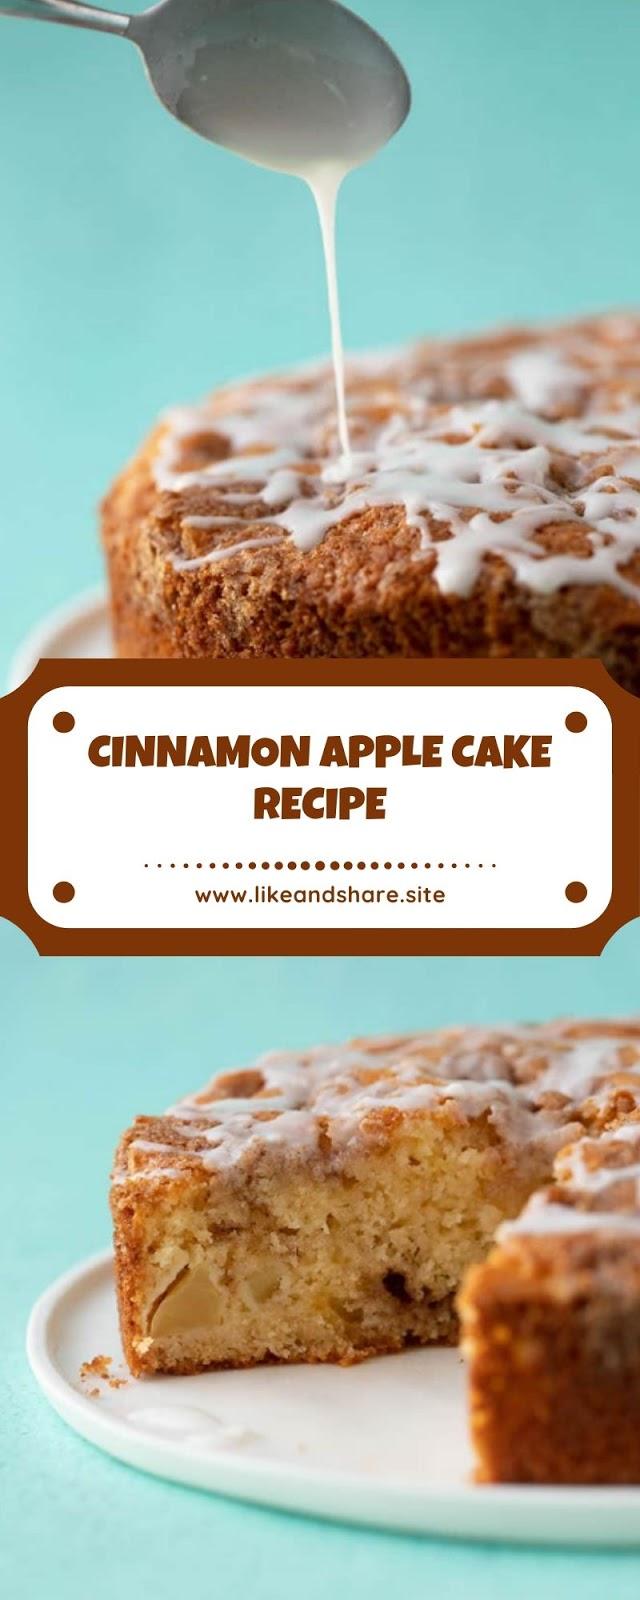 CINNAMON APPLE CAKE RECIPE